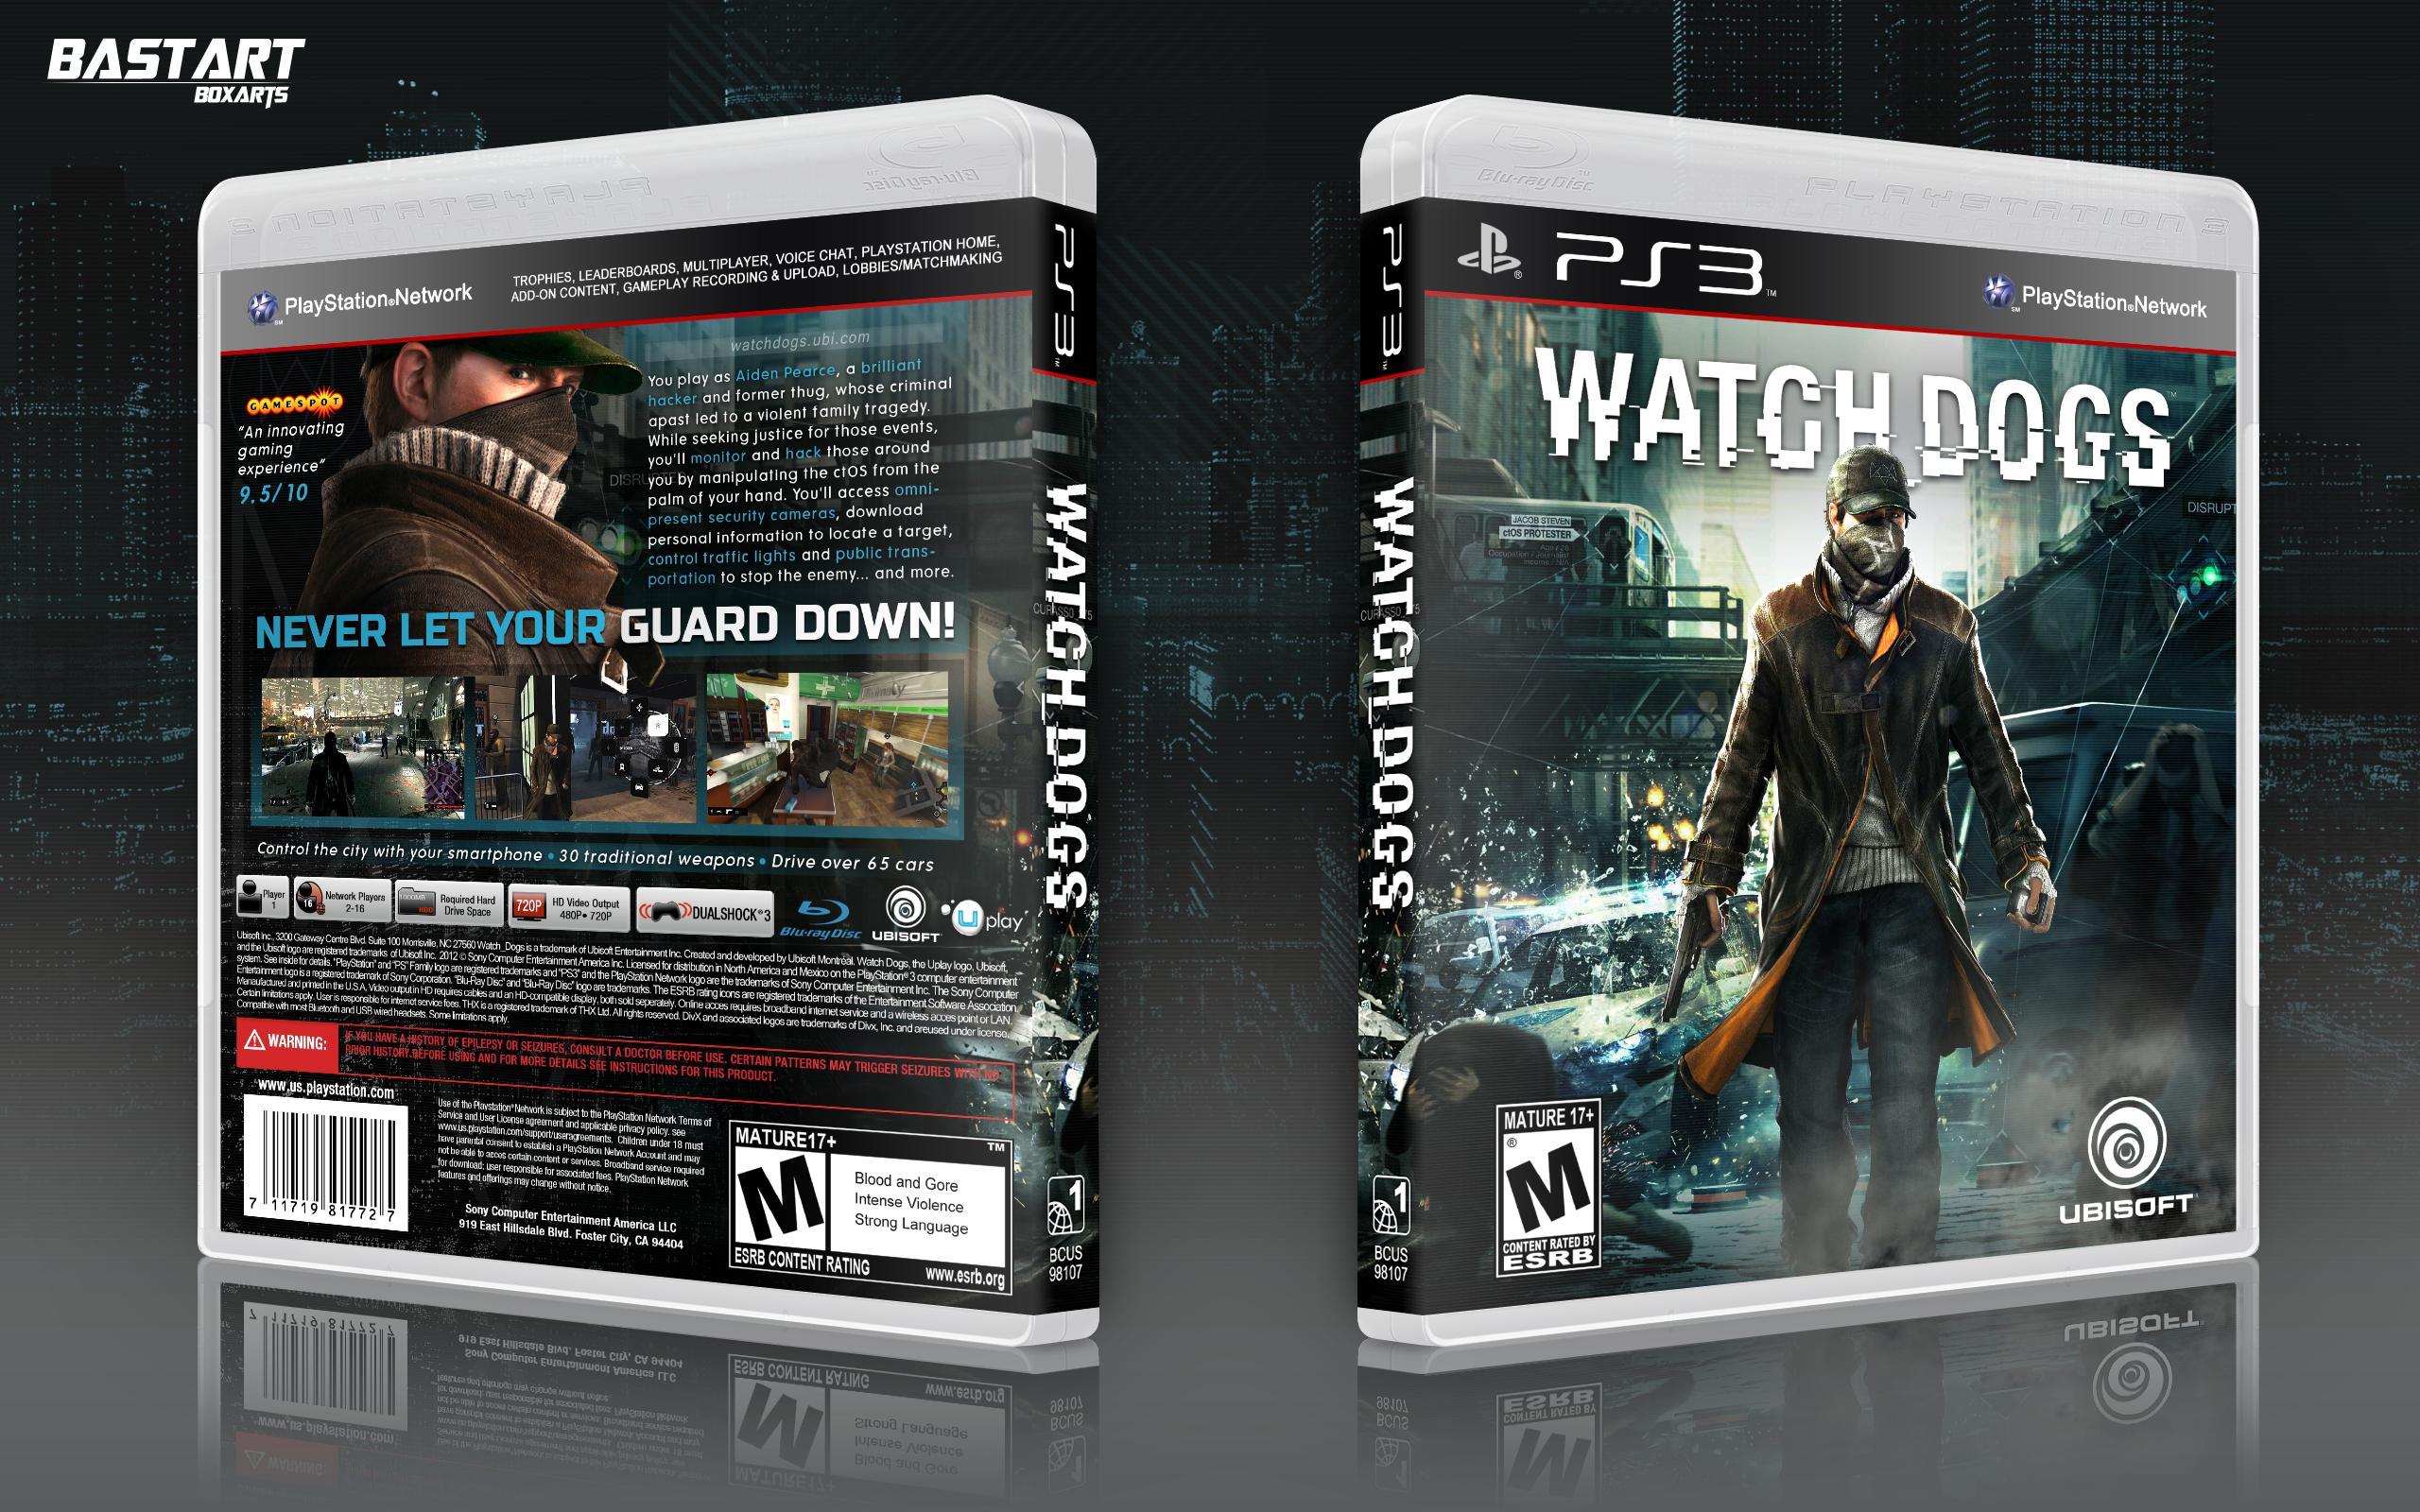 Watch_Dogs PlayStation 3 Box Art Cover by Bastart Watch Dogs Ps4 Box Art